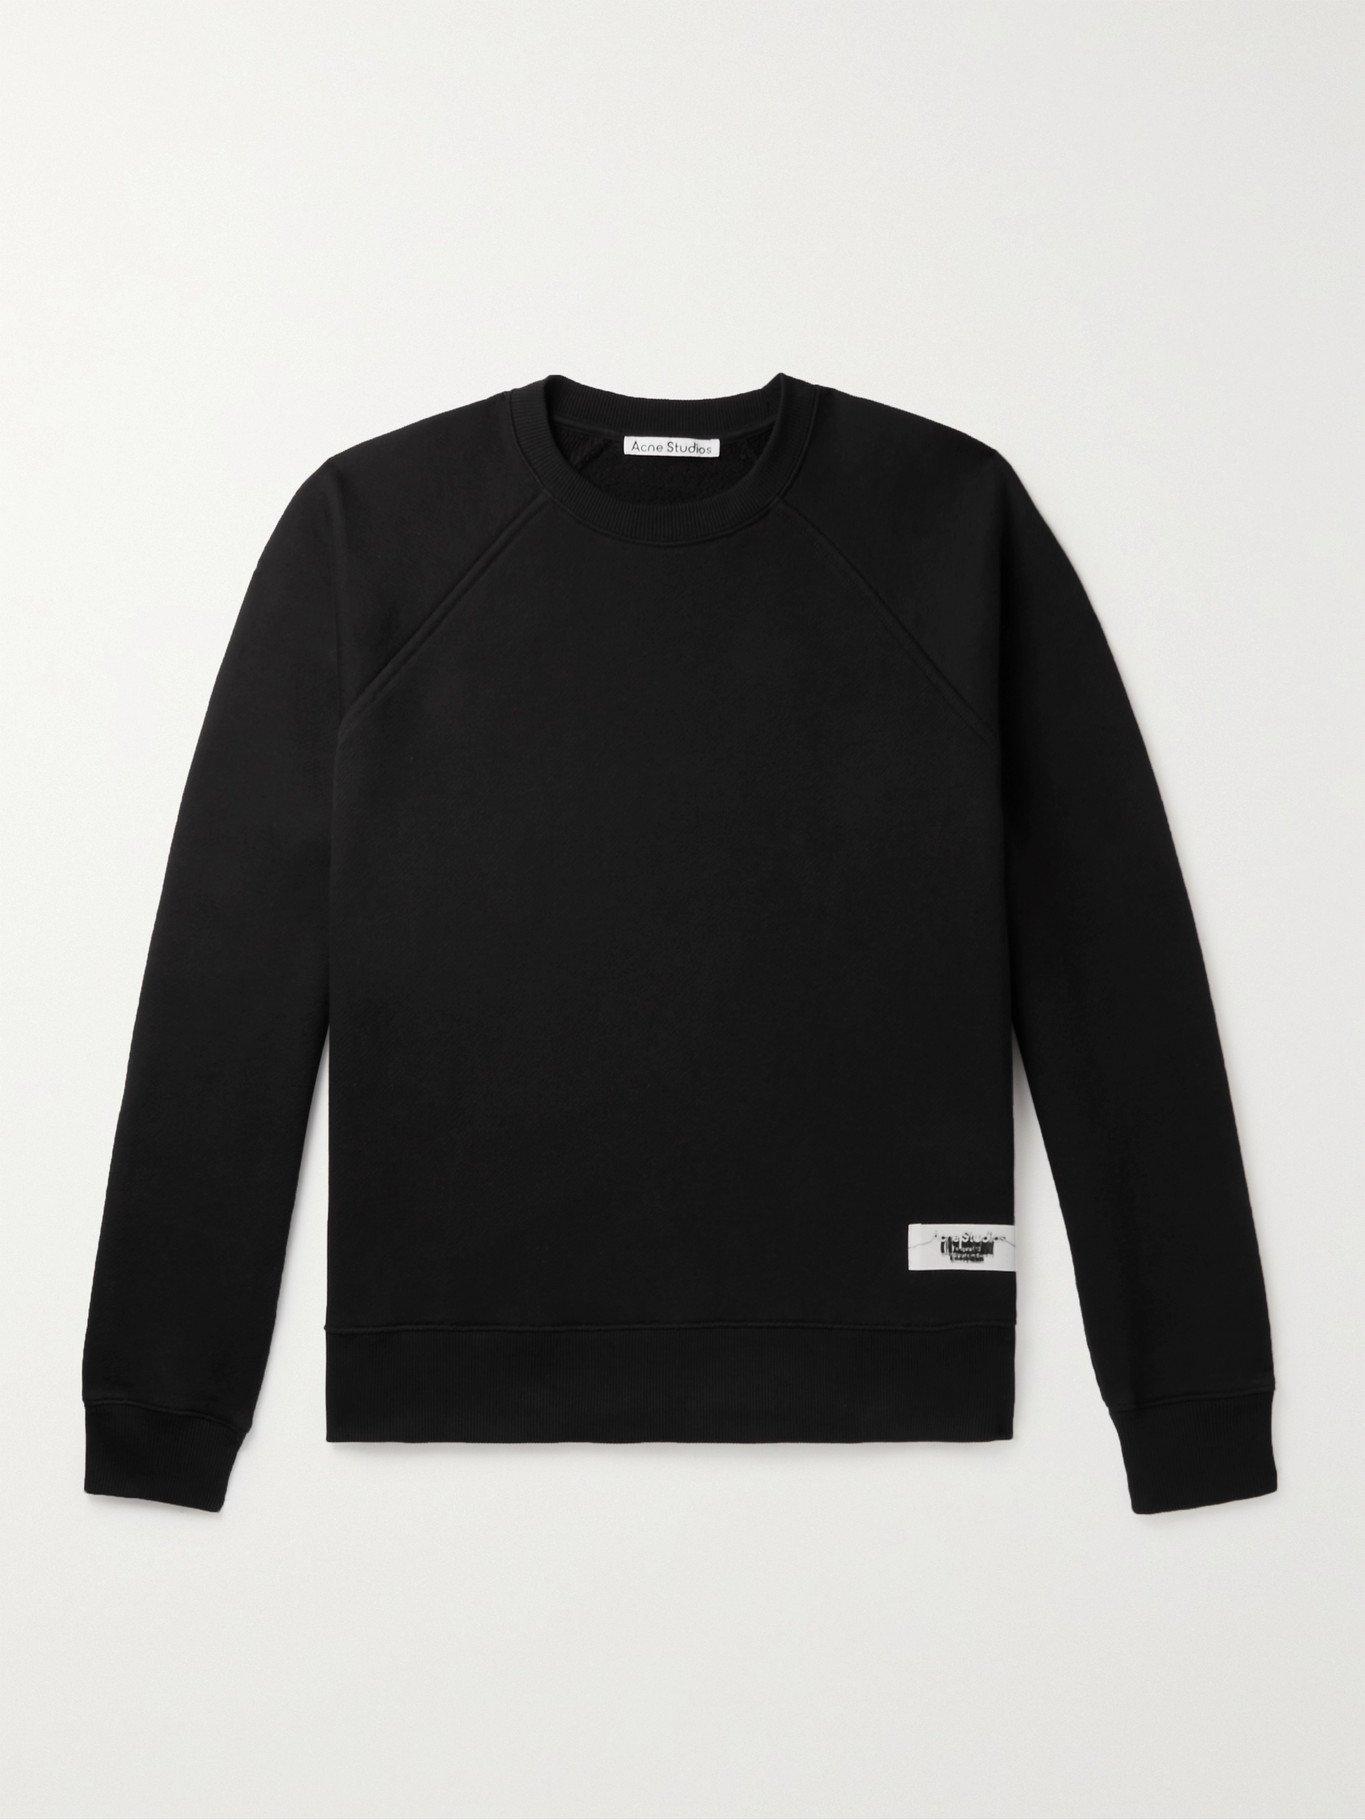 Photo: ACNE STUDIOS - Logo-Appliquéd Cotton-Blend Jersey Sweatshirt - Black